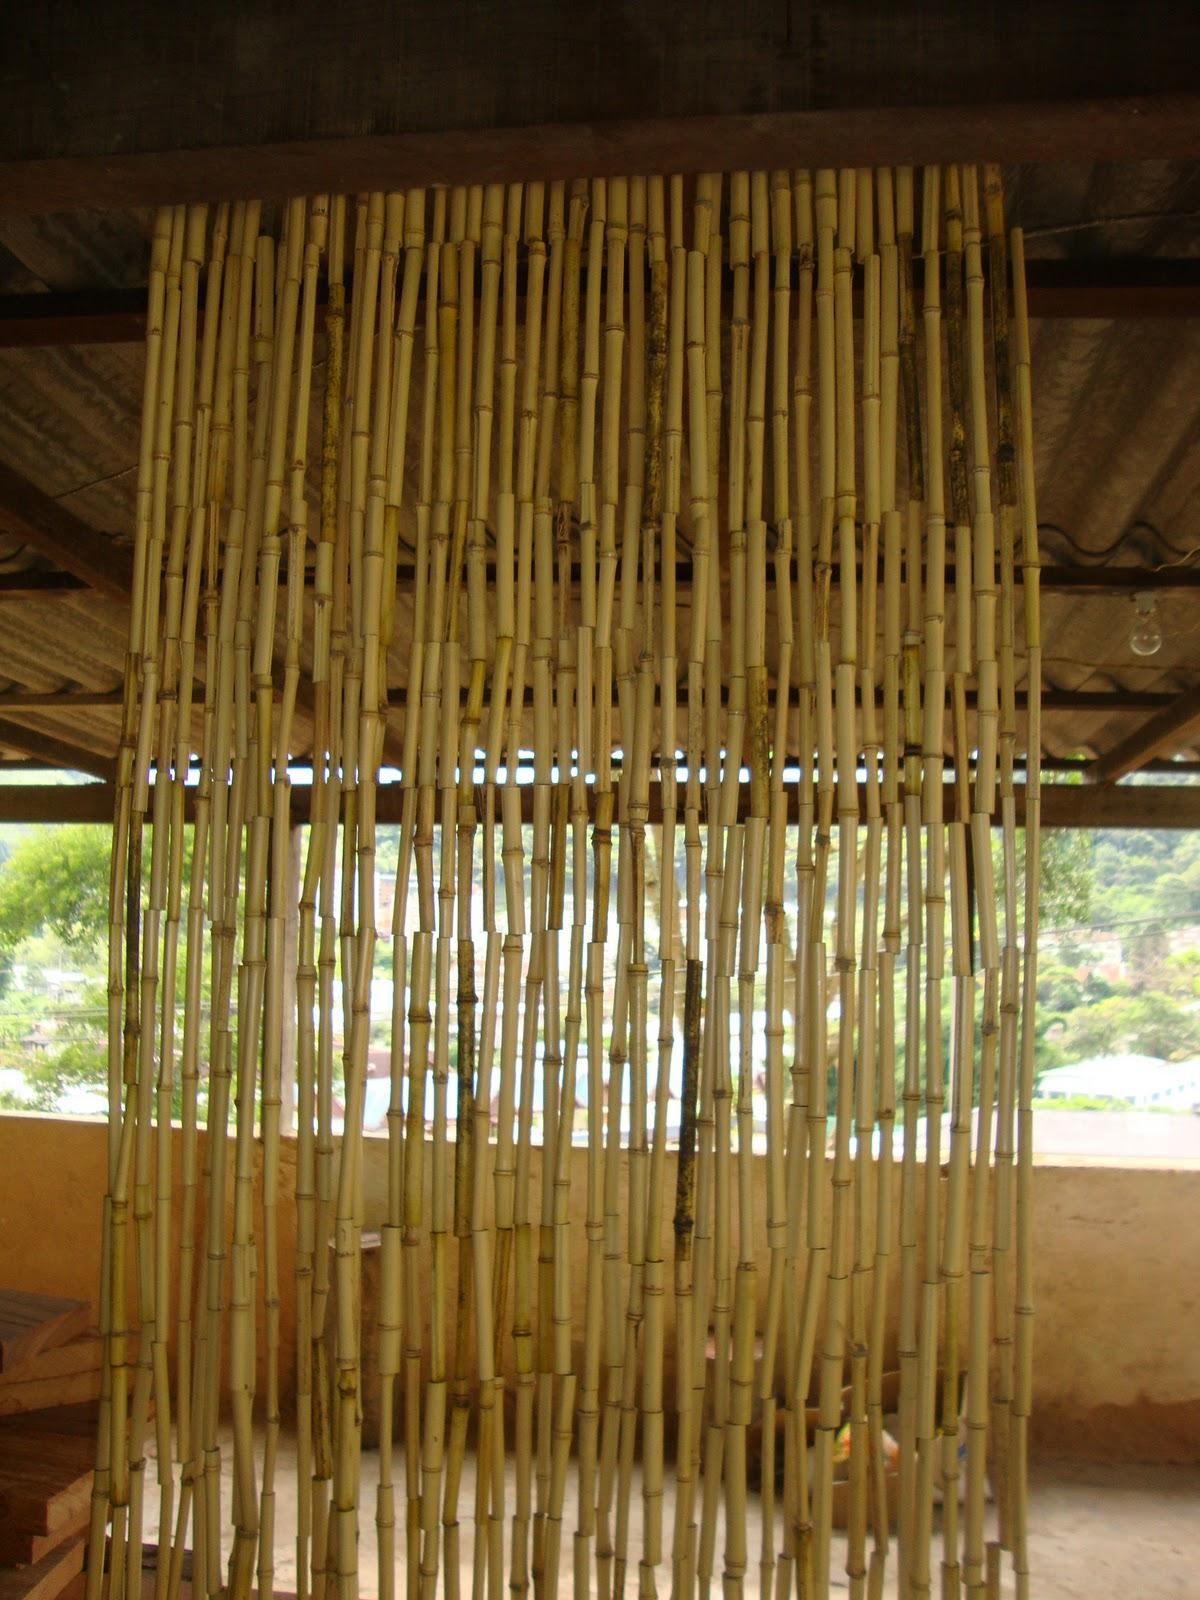 Artes em bambu cortina em bambu - Cortina de bambu ...